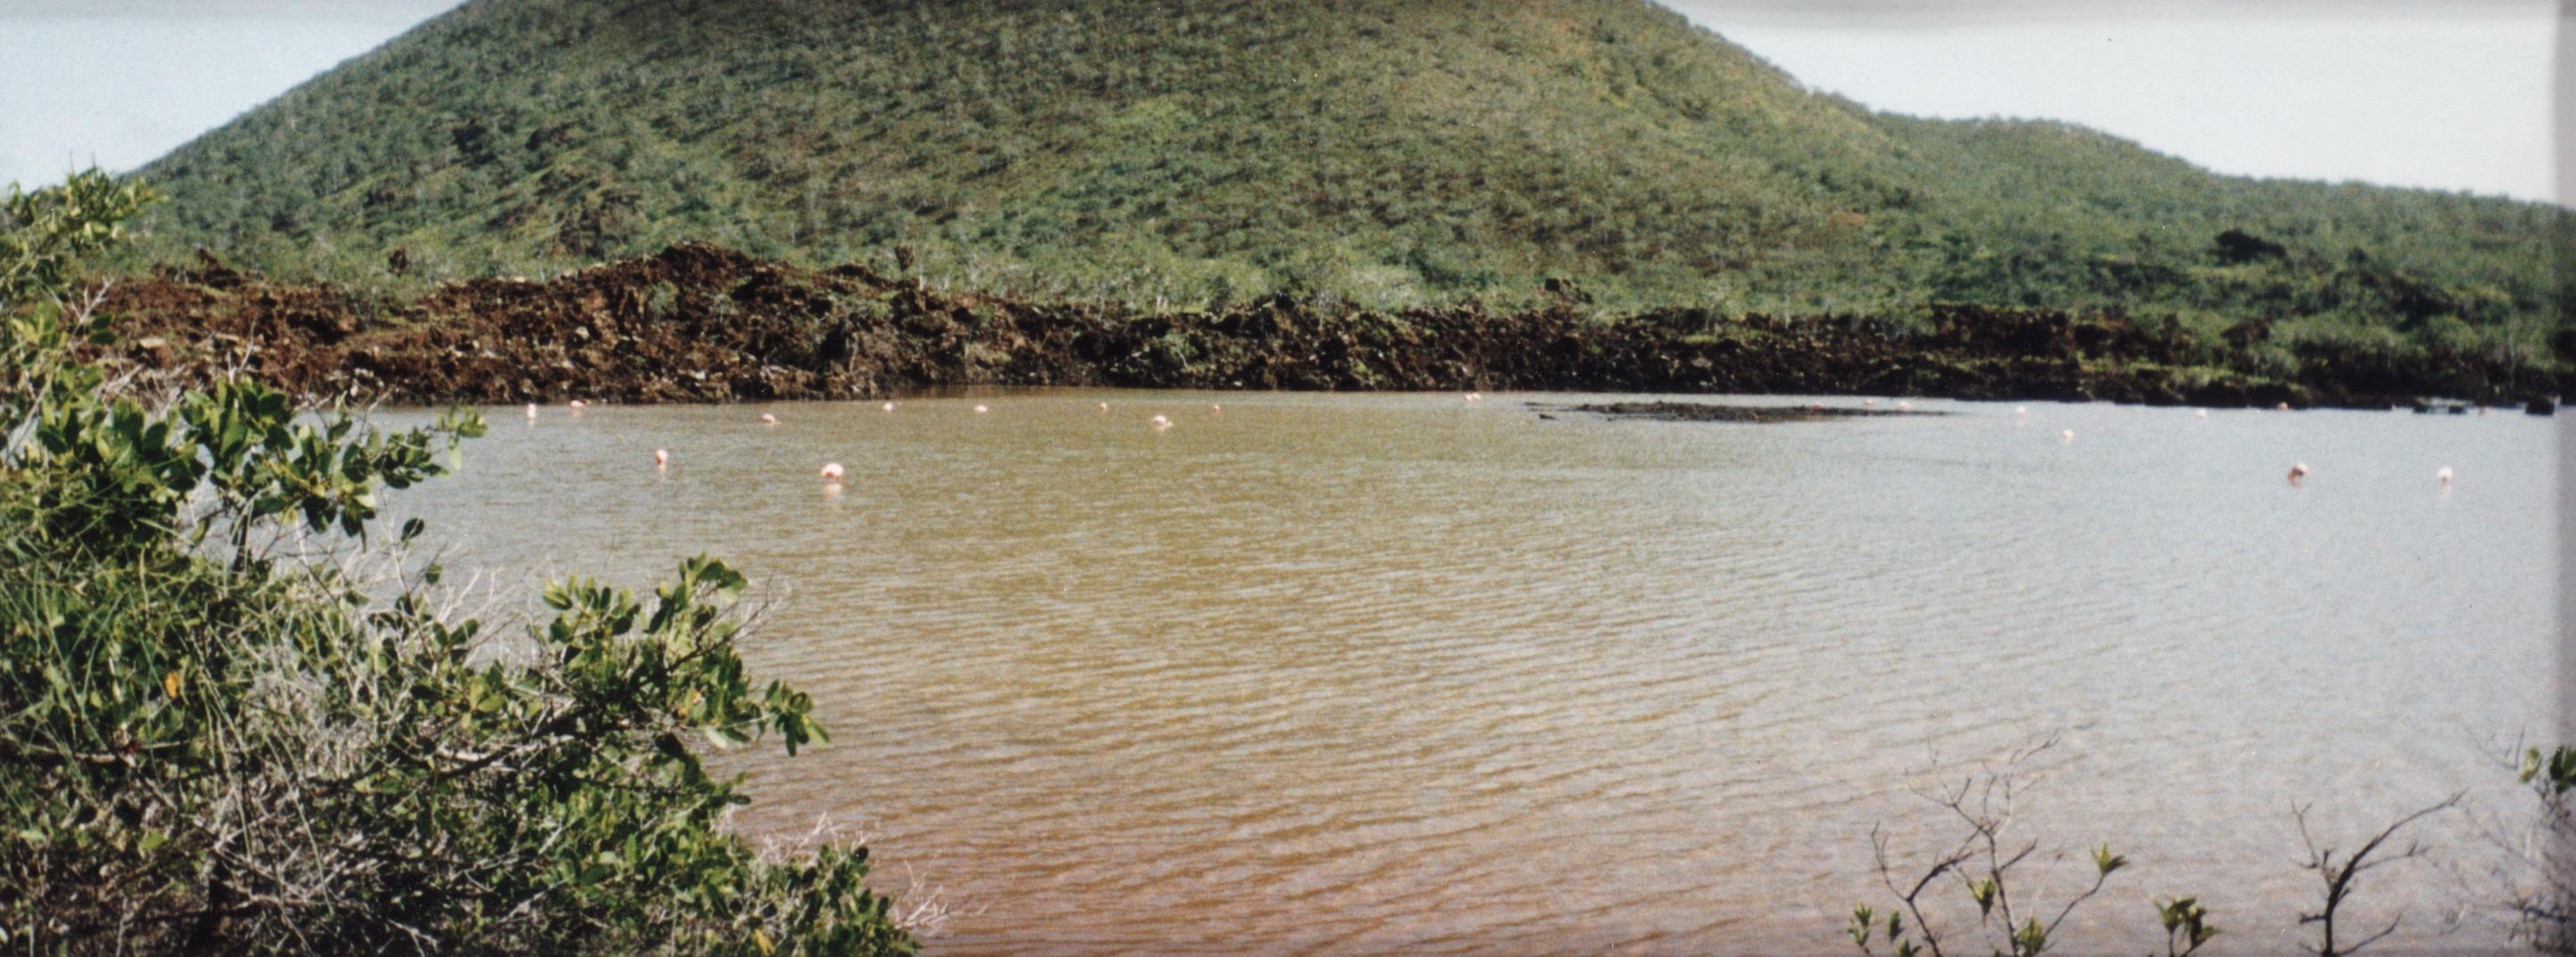 Greater Flamingos (Phoenicopterus ruber) in Flamingo Lagoon